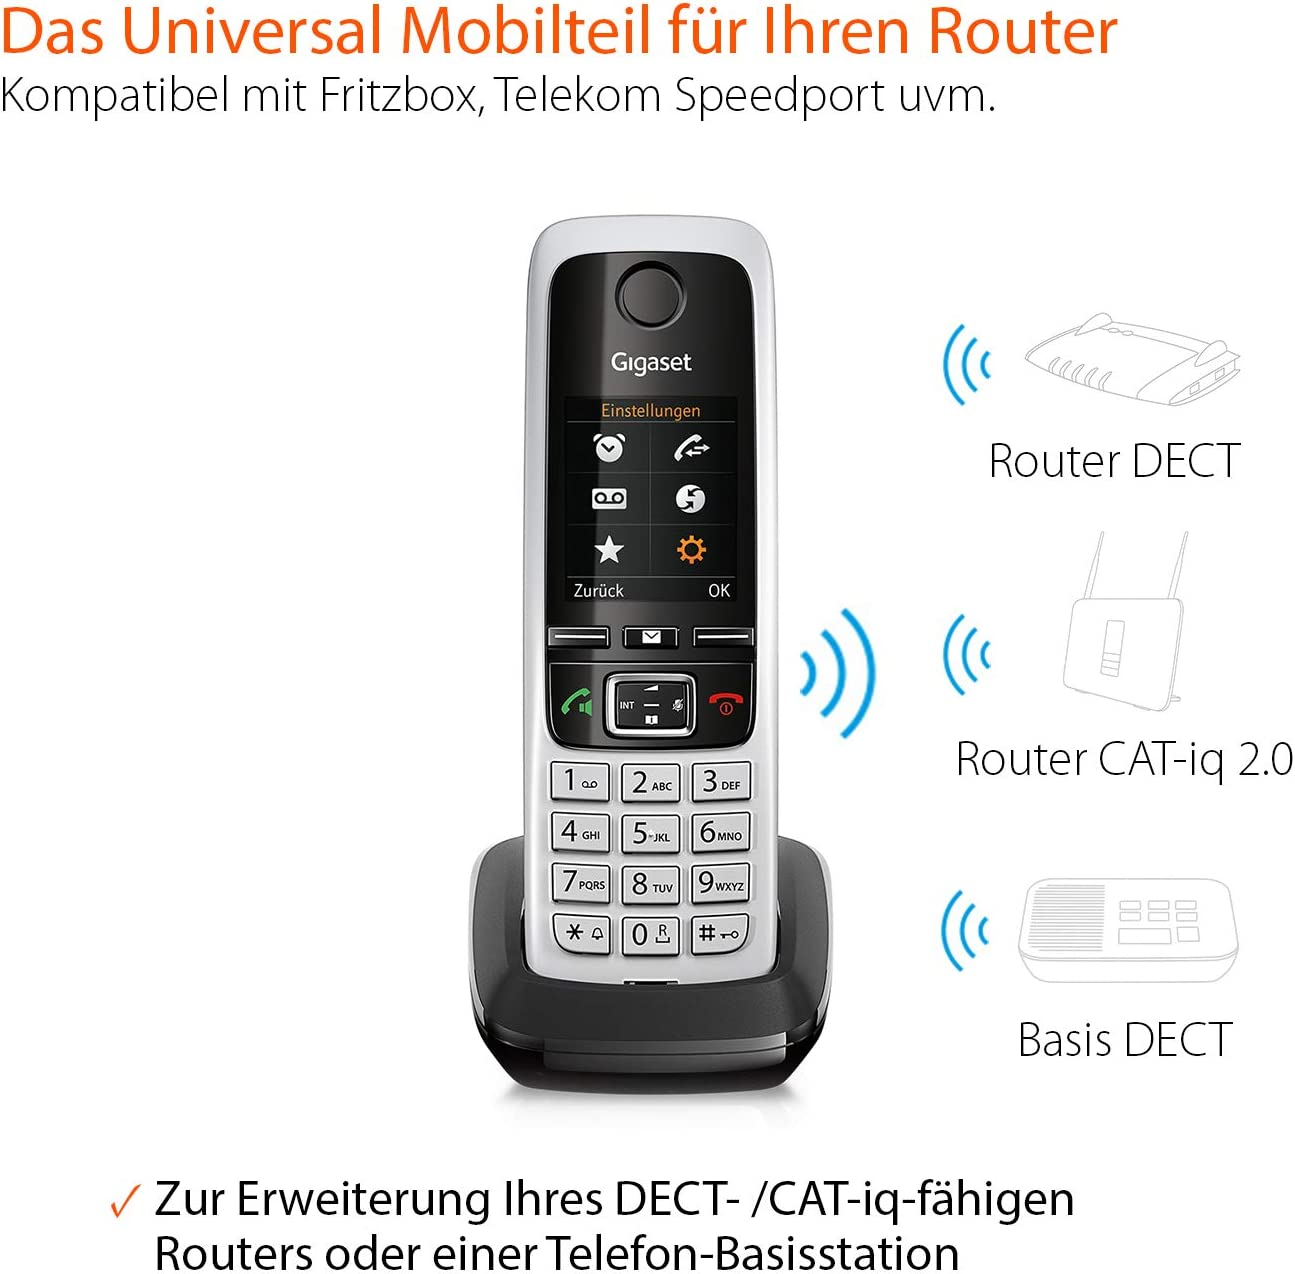 Gigaset C430 HX Duo, ANALOGES TELEFON Schwarz, ZWEI MOBILTEILE: Amazon.es: Informática